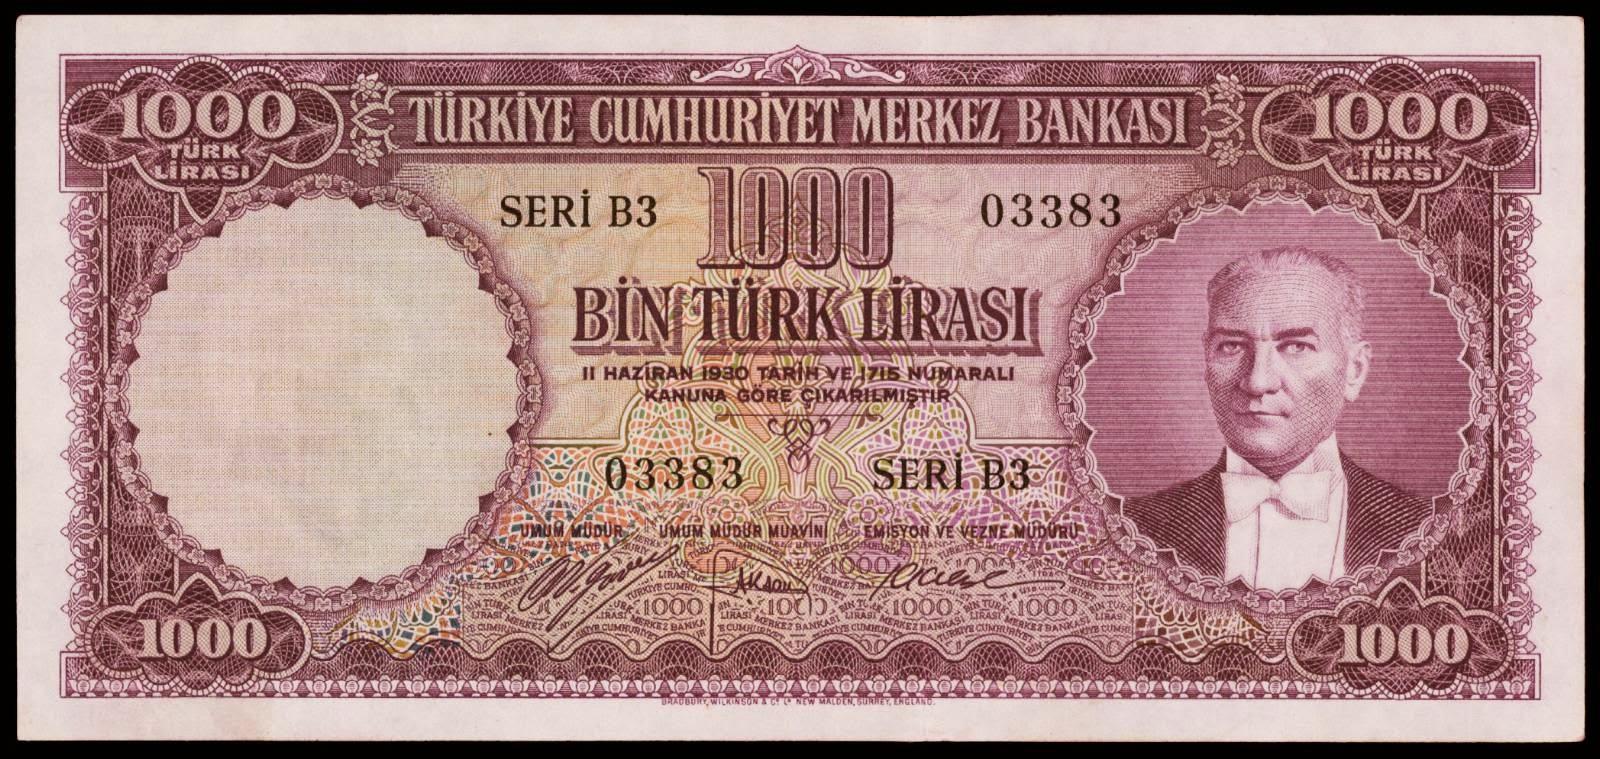 Turkey banknotes 1000 Turkish Lira banknote 1953 Atatürk